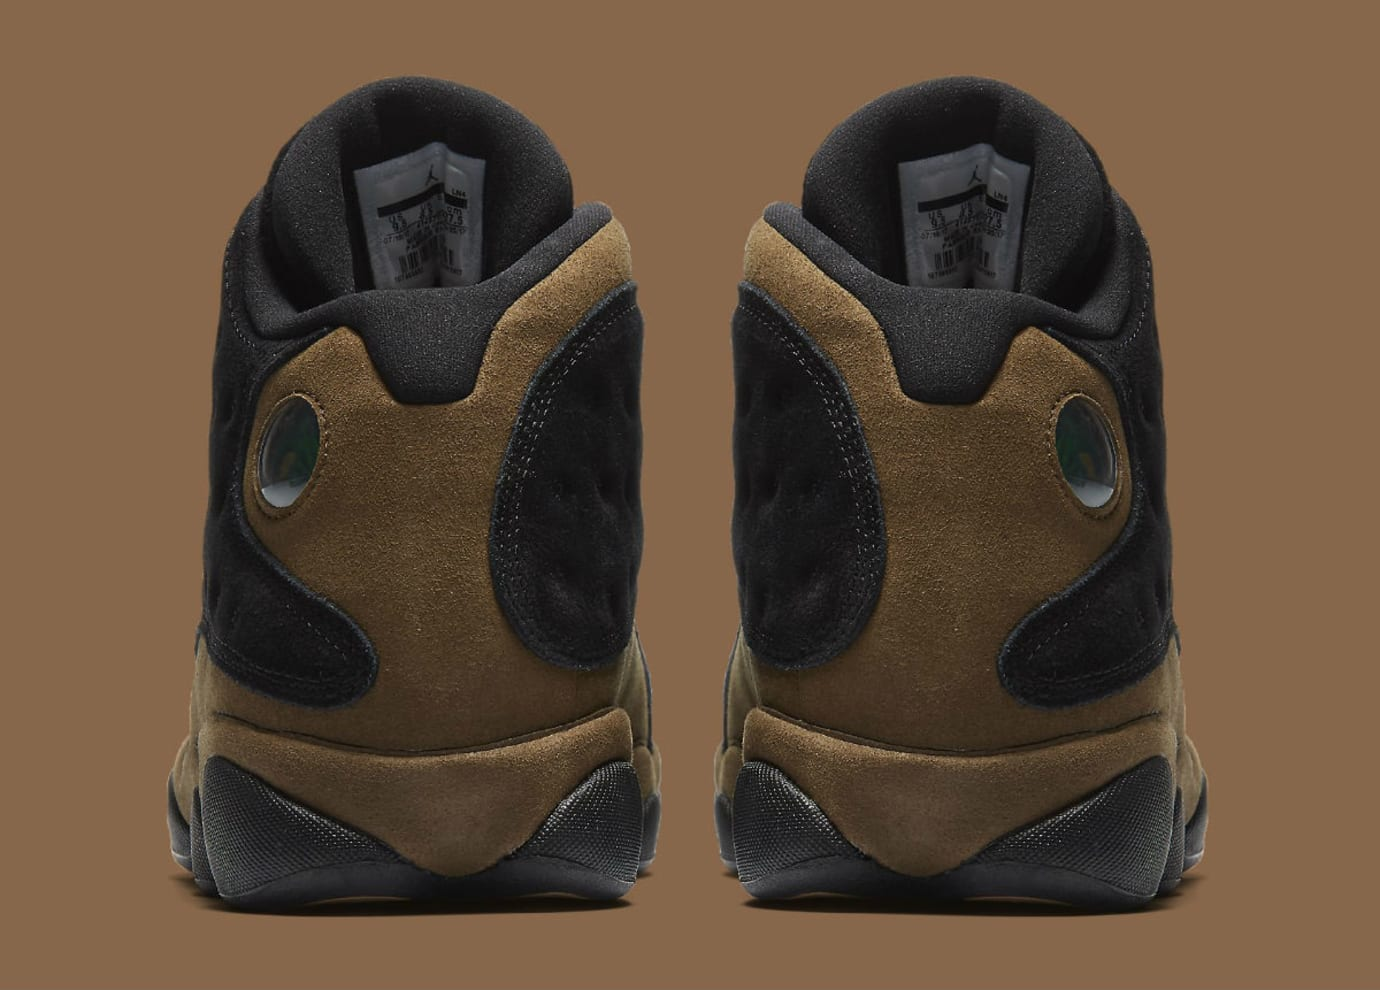 Air Jordan 13 XIII Olive Release Date 414571-006 Heel